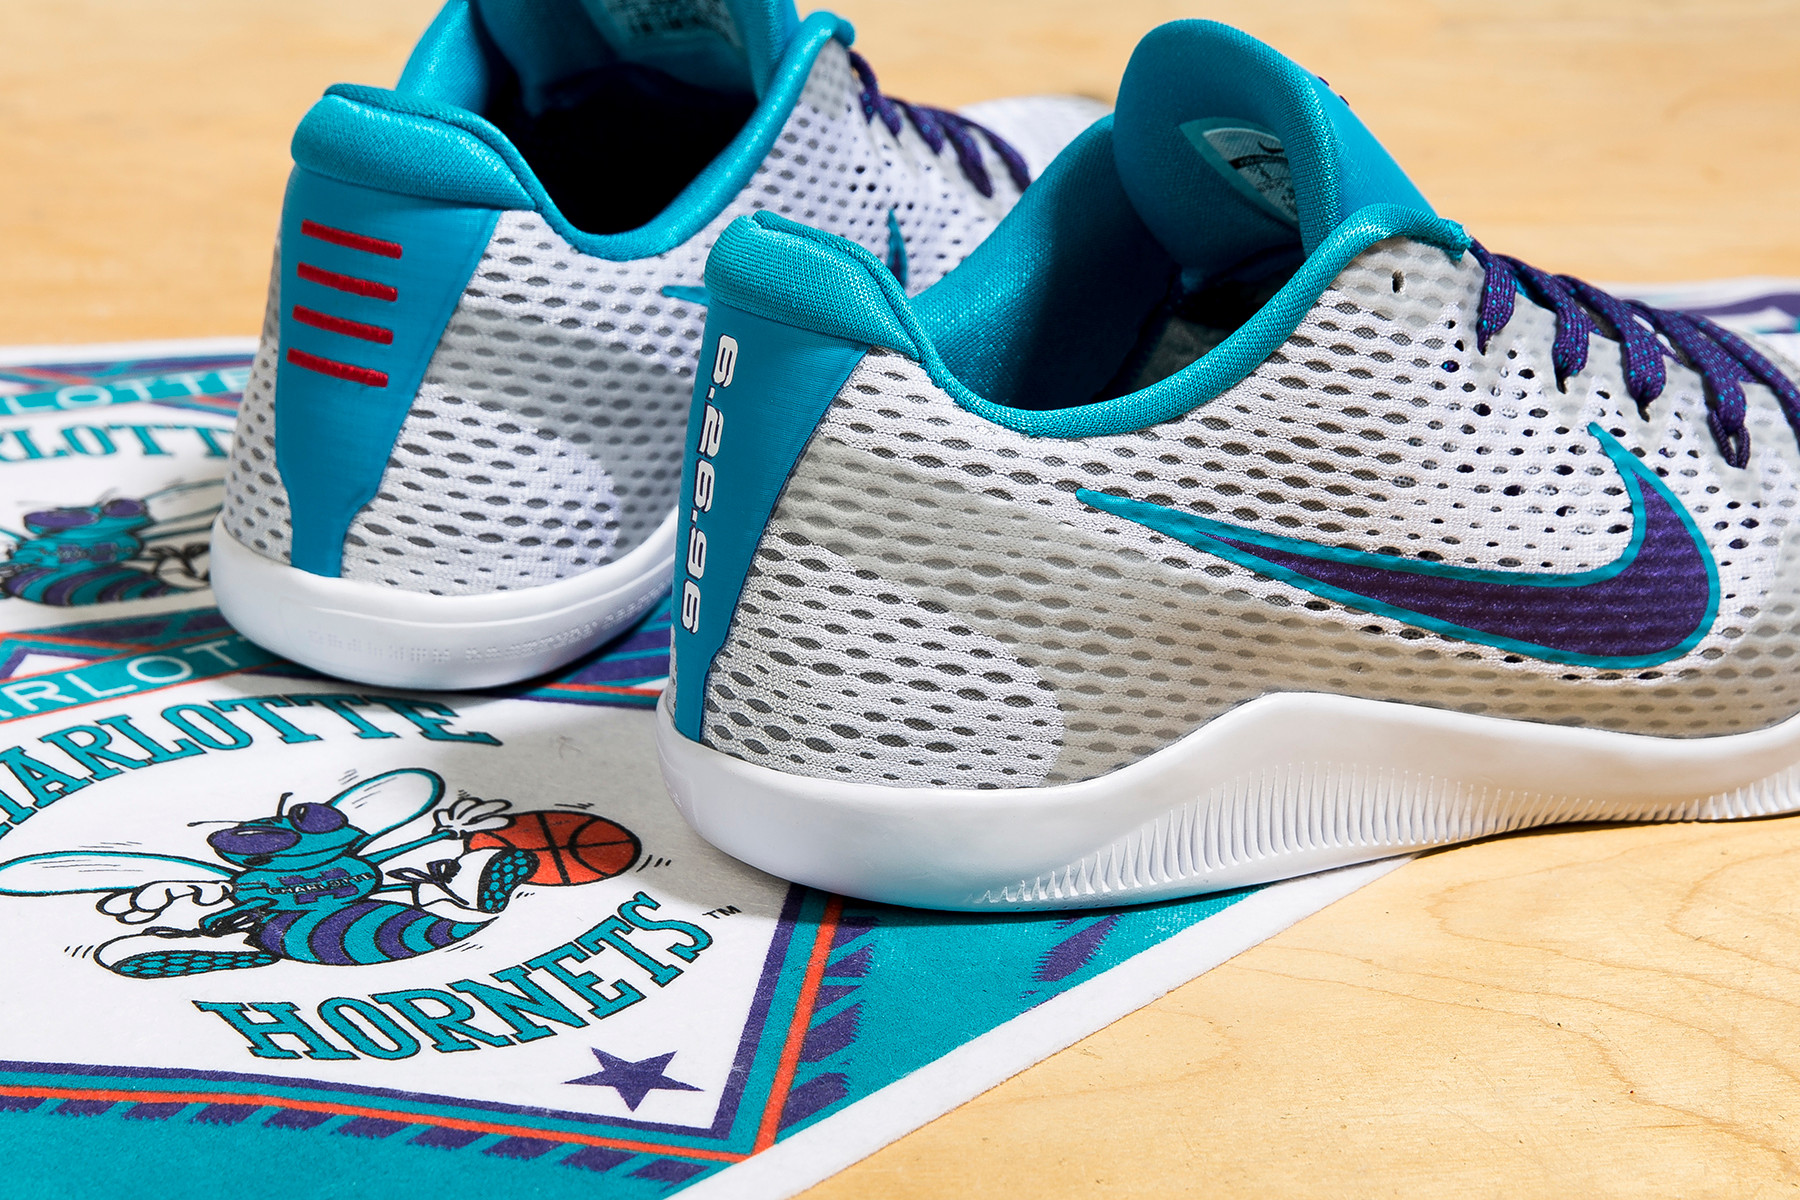 Nike Kobe 11 Draft Day Hornets Colorway